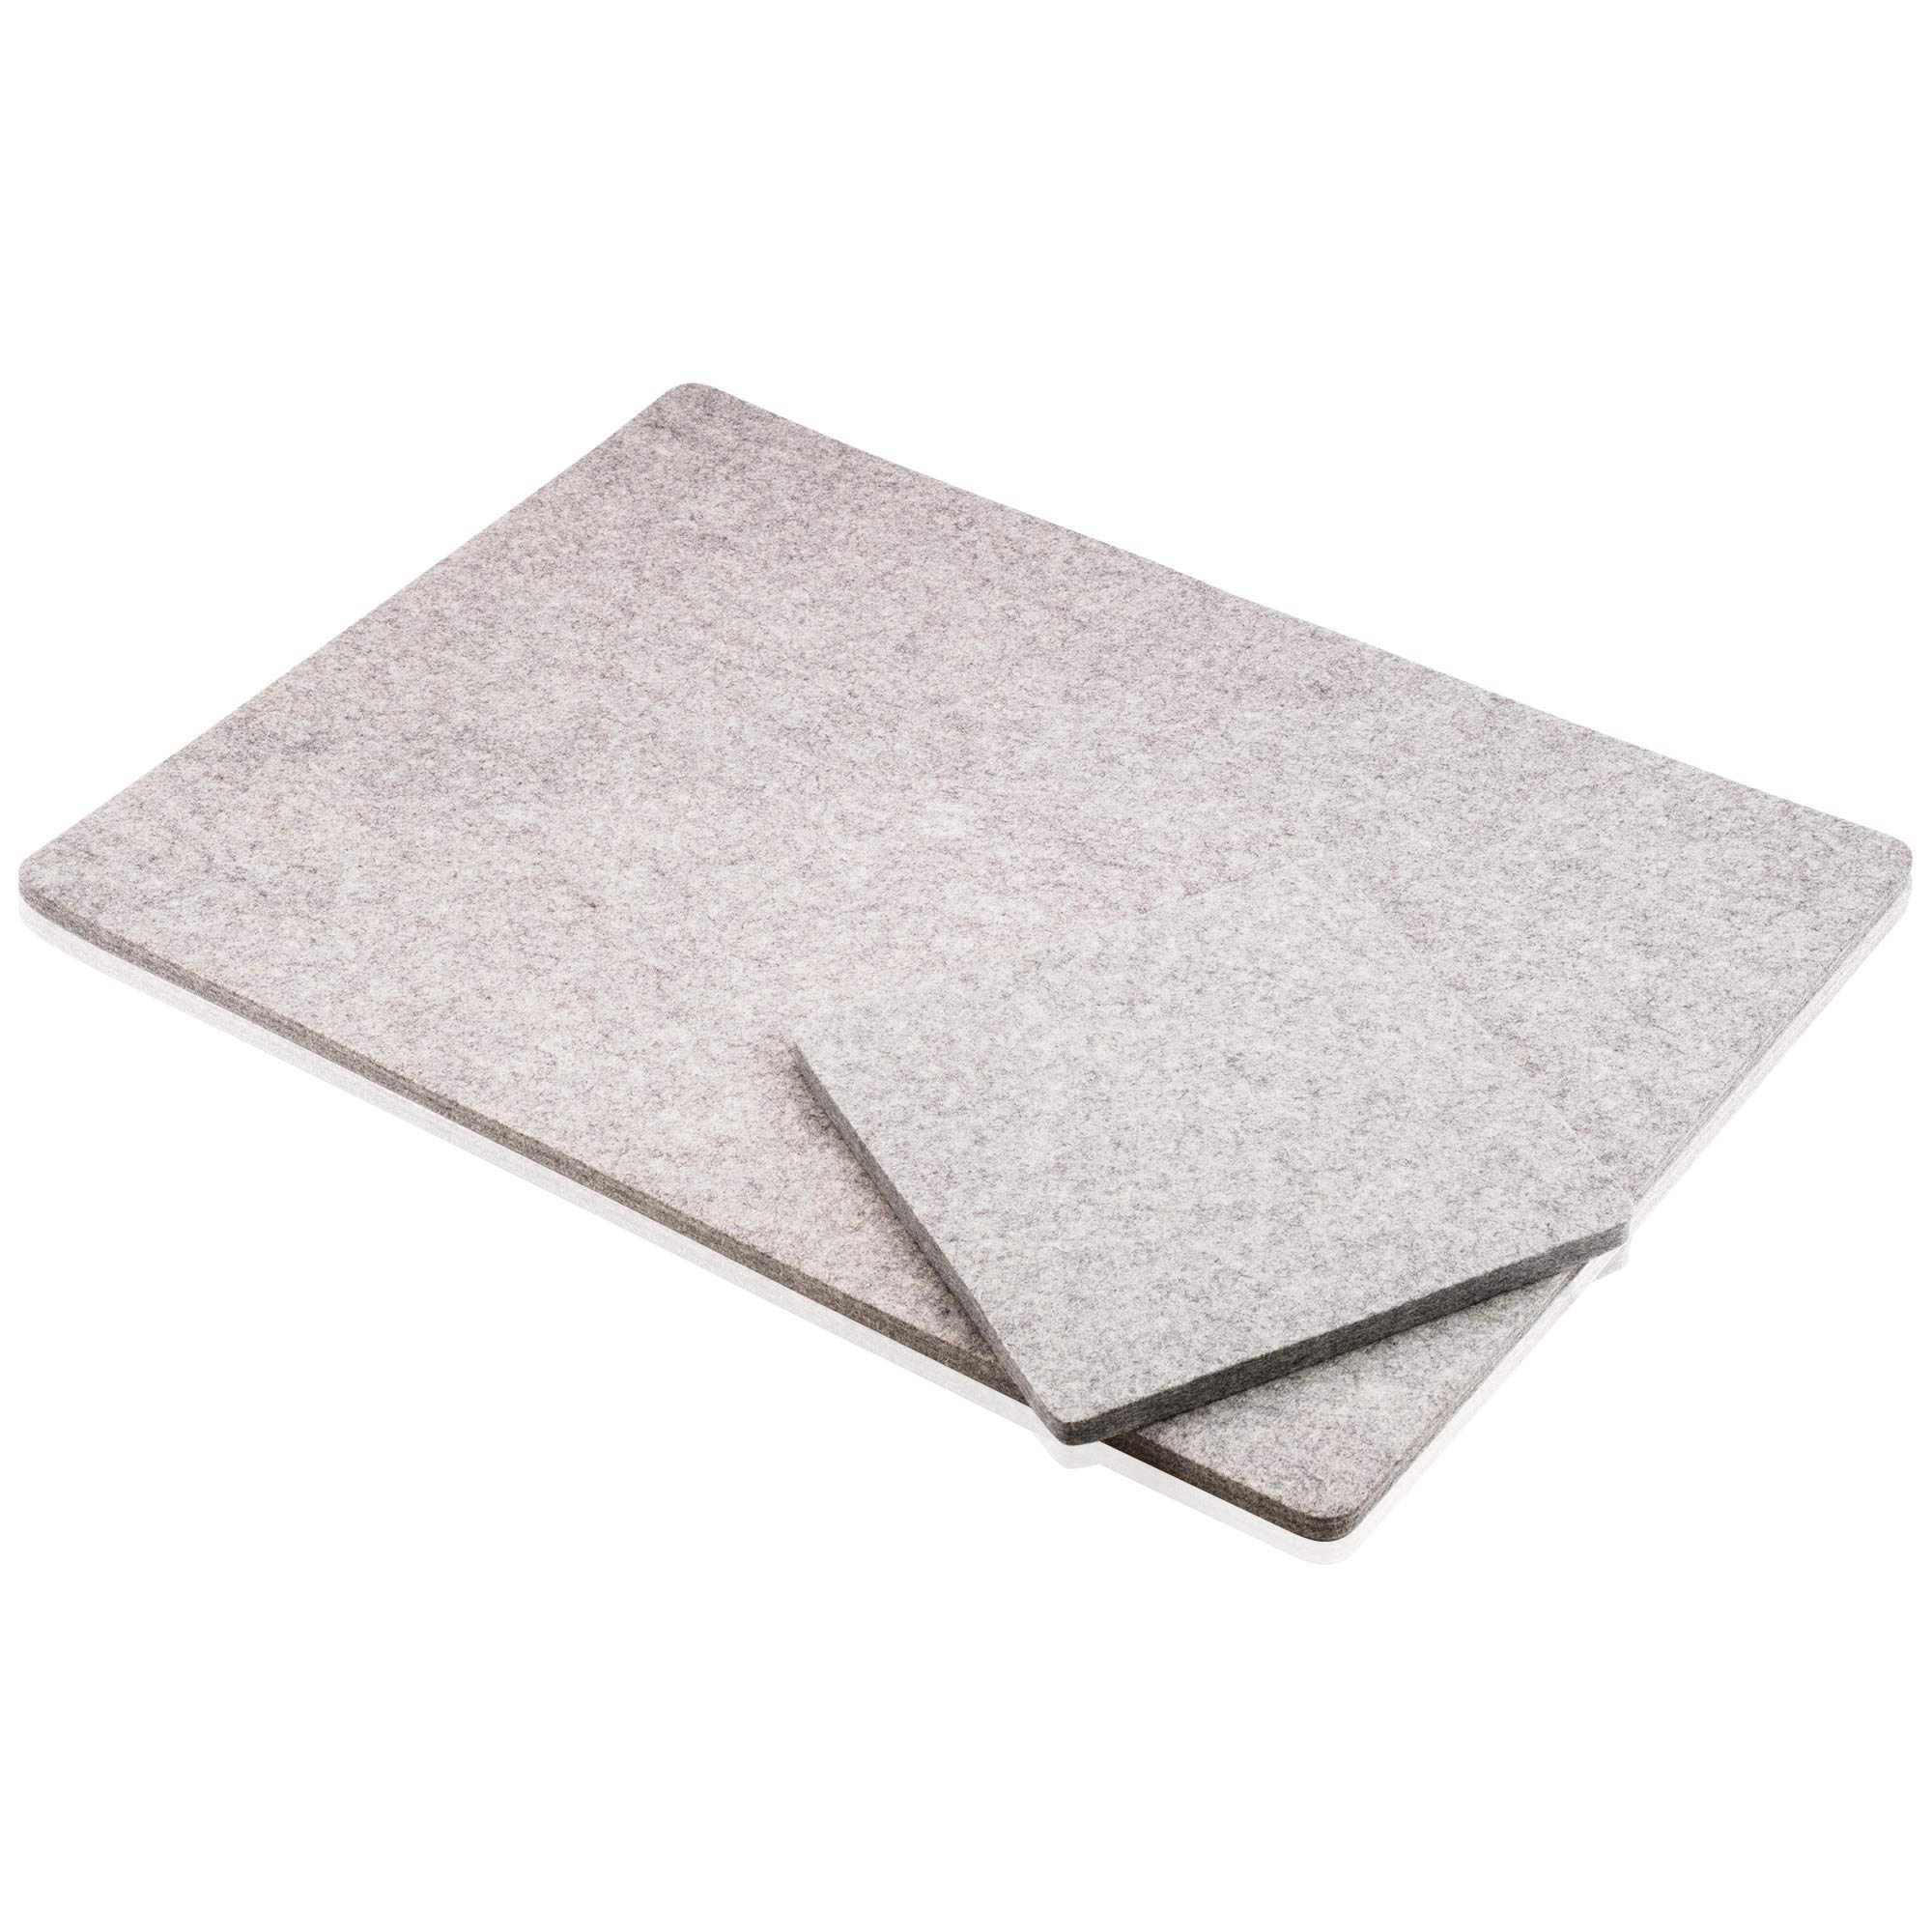 x17 Wool Pressing Mat Quilting